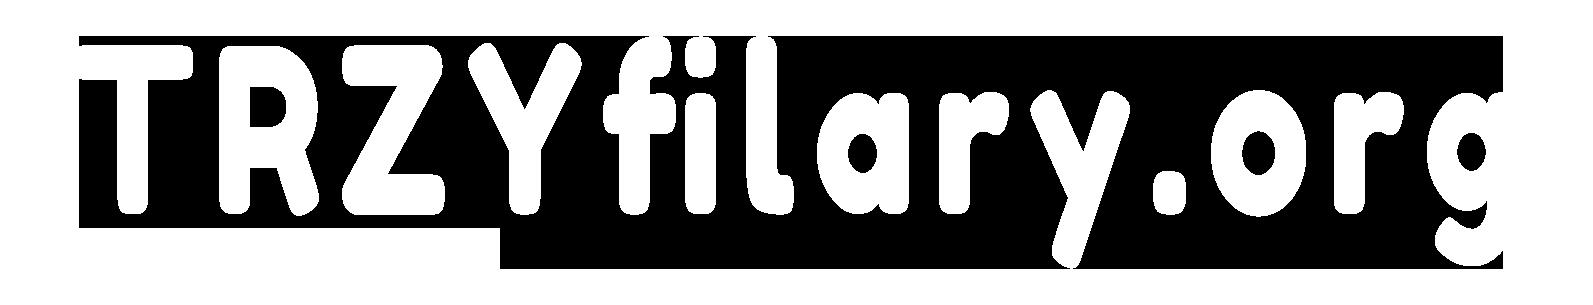 TRZYFilary.org